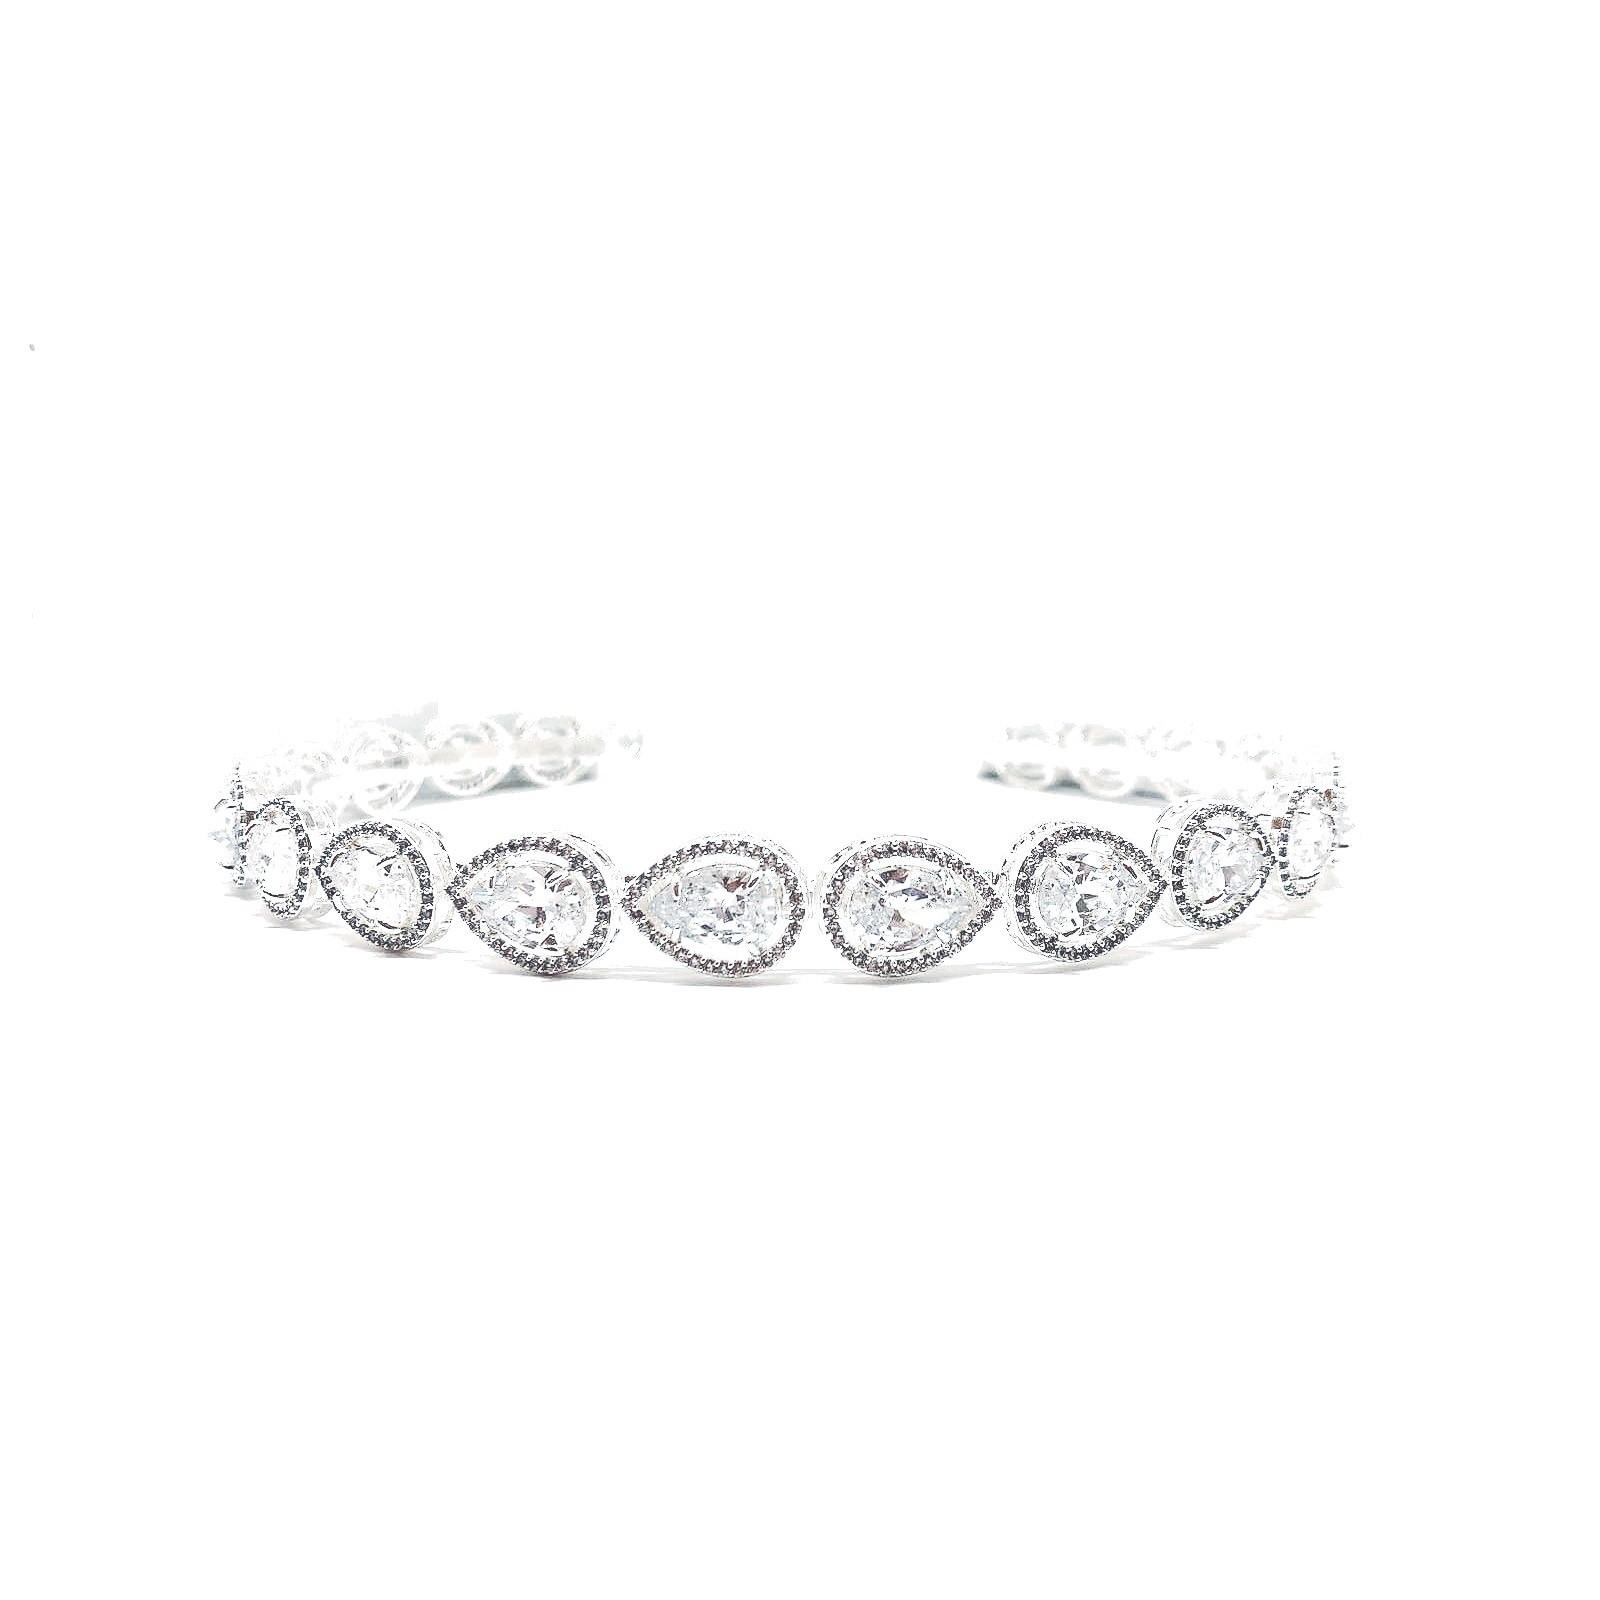 Tiara para Noivas, Prata cravejada de Zircônias - Tiara Florença